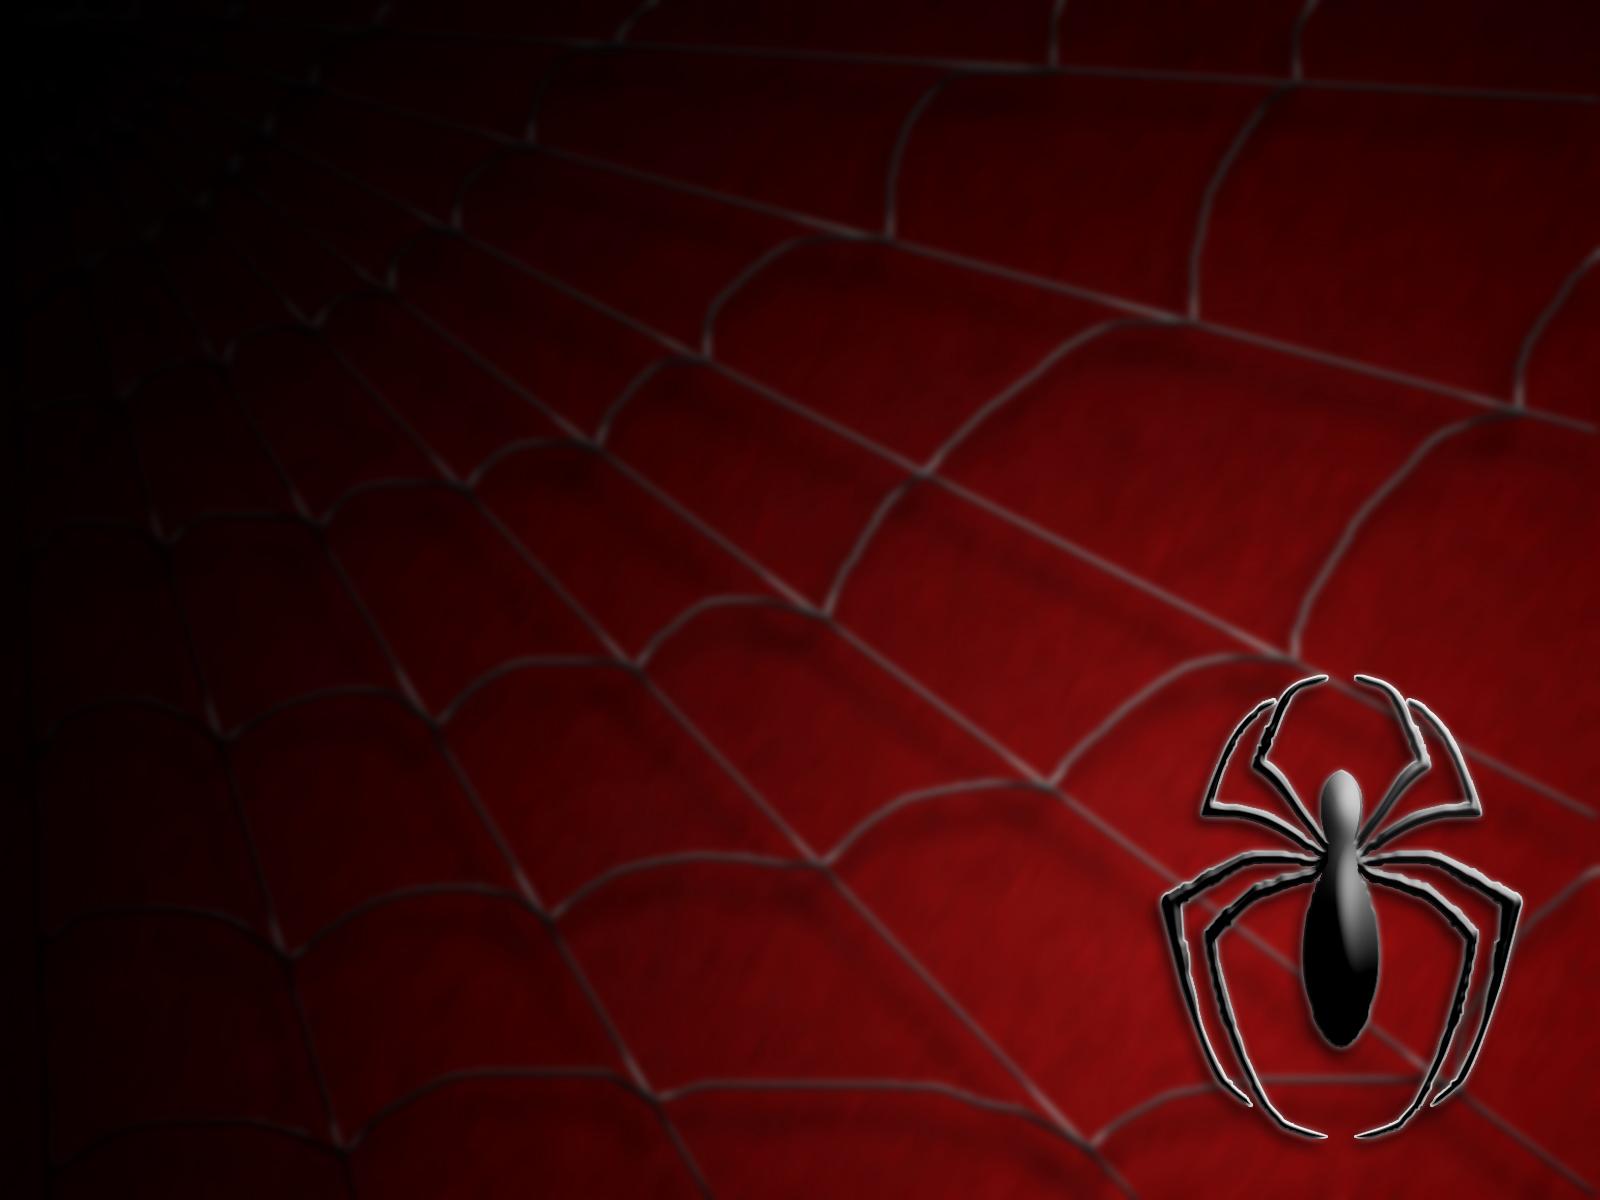 Wallpaper Spider Man HD dekstop wallpapers   Wallpaper Spider Man 1600x1200